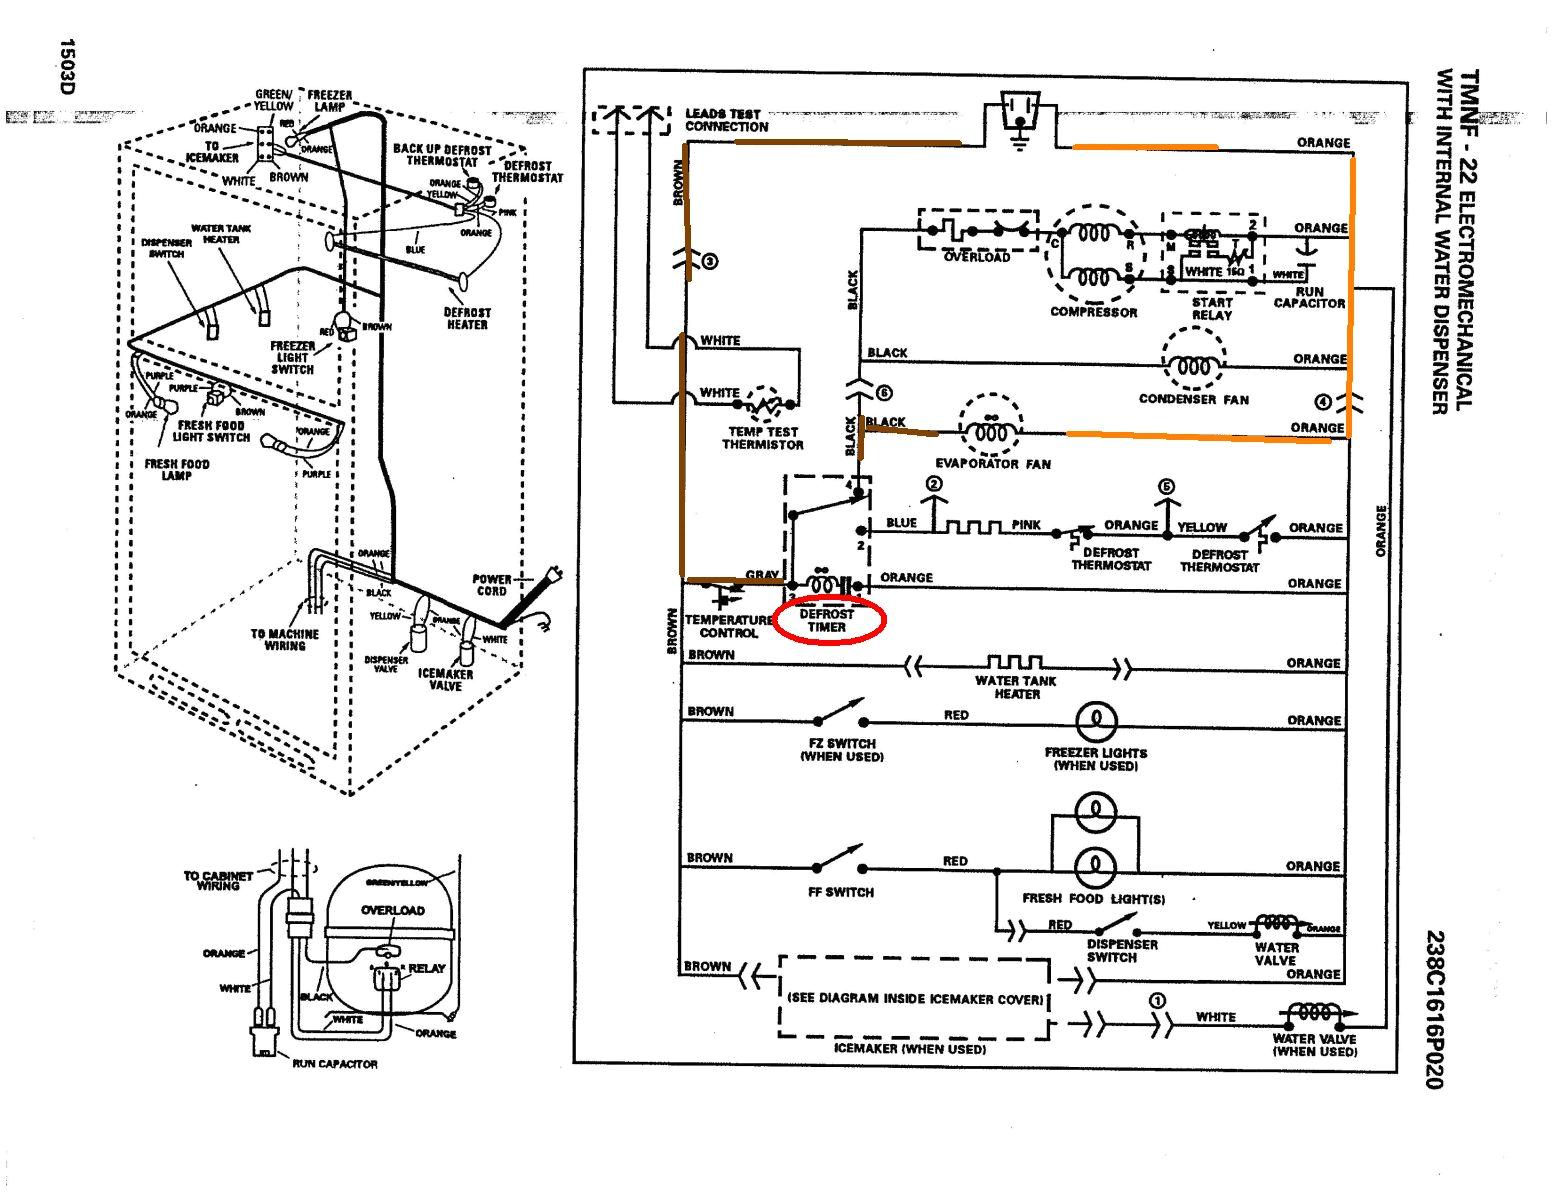 ge 12726 wiring diagram lovely wiring diagrams motor controls old ge motor wiring diagram for 1 jpg